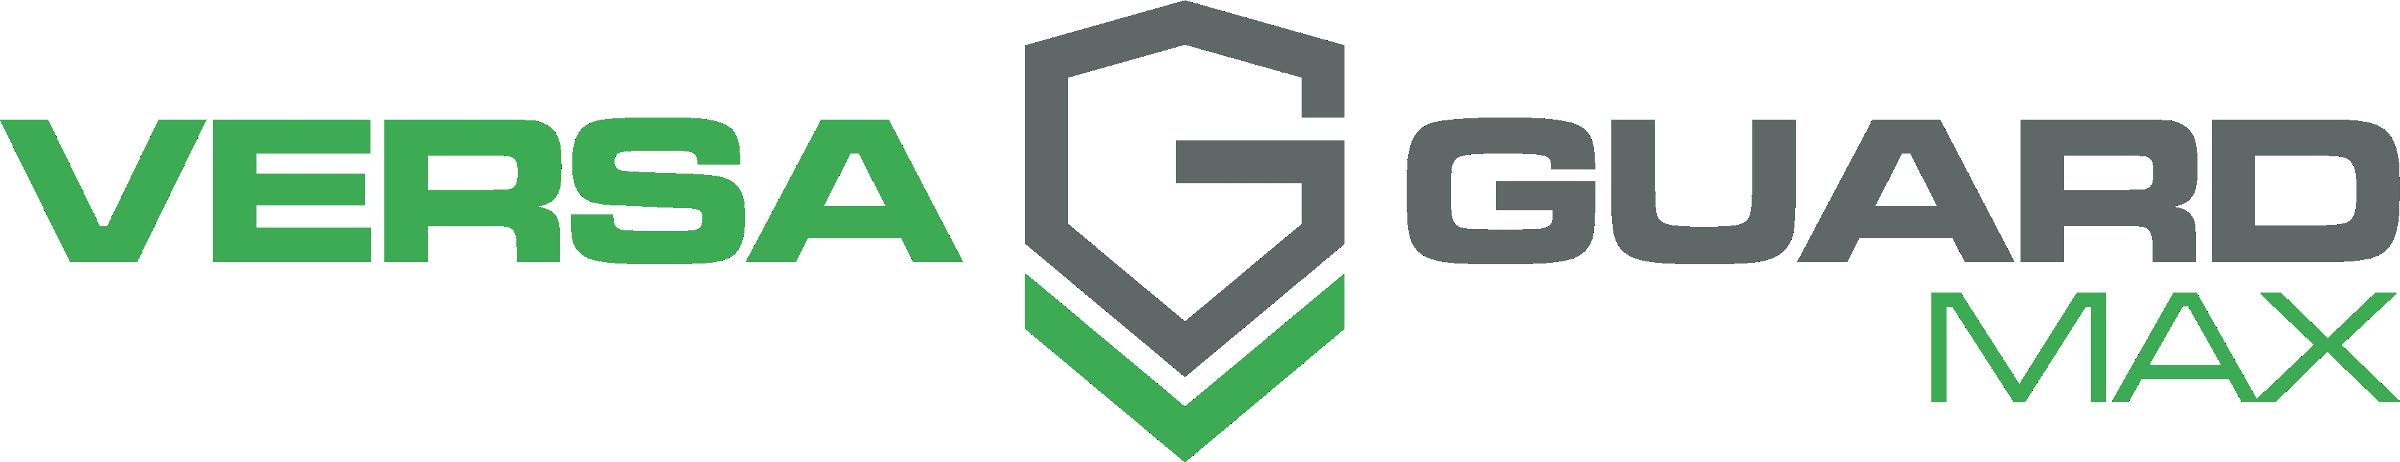 VersaGuard Max logo